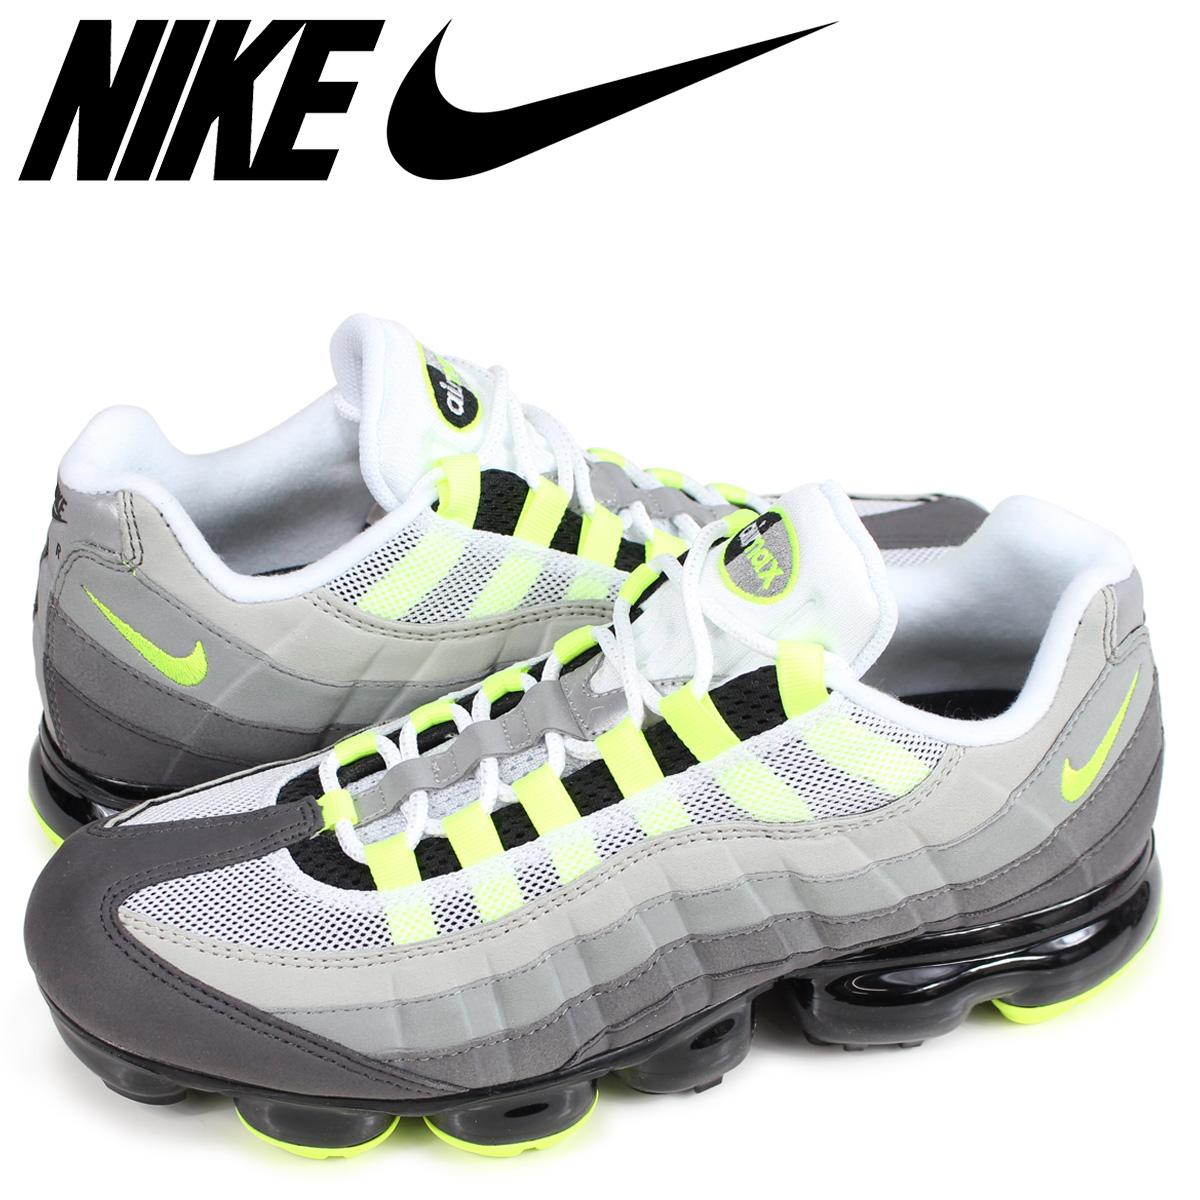 buy popular a6923 f74c1 NIKE AIR VAPORMAX 95 NEON Nike air vapor max 95 sneakers men neon yellow  AJ7292-001 [the 9/6 additional arrival]